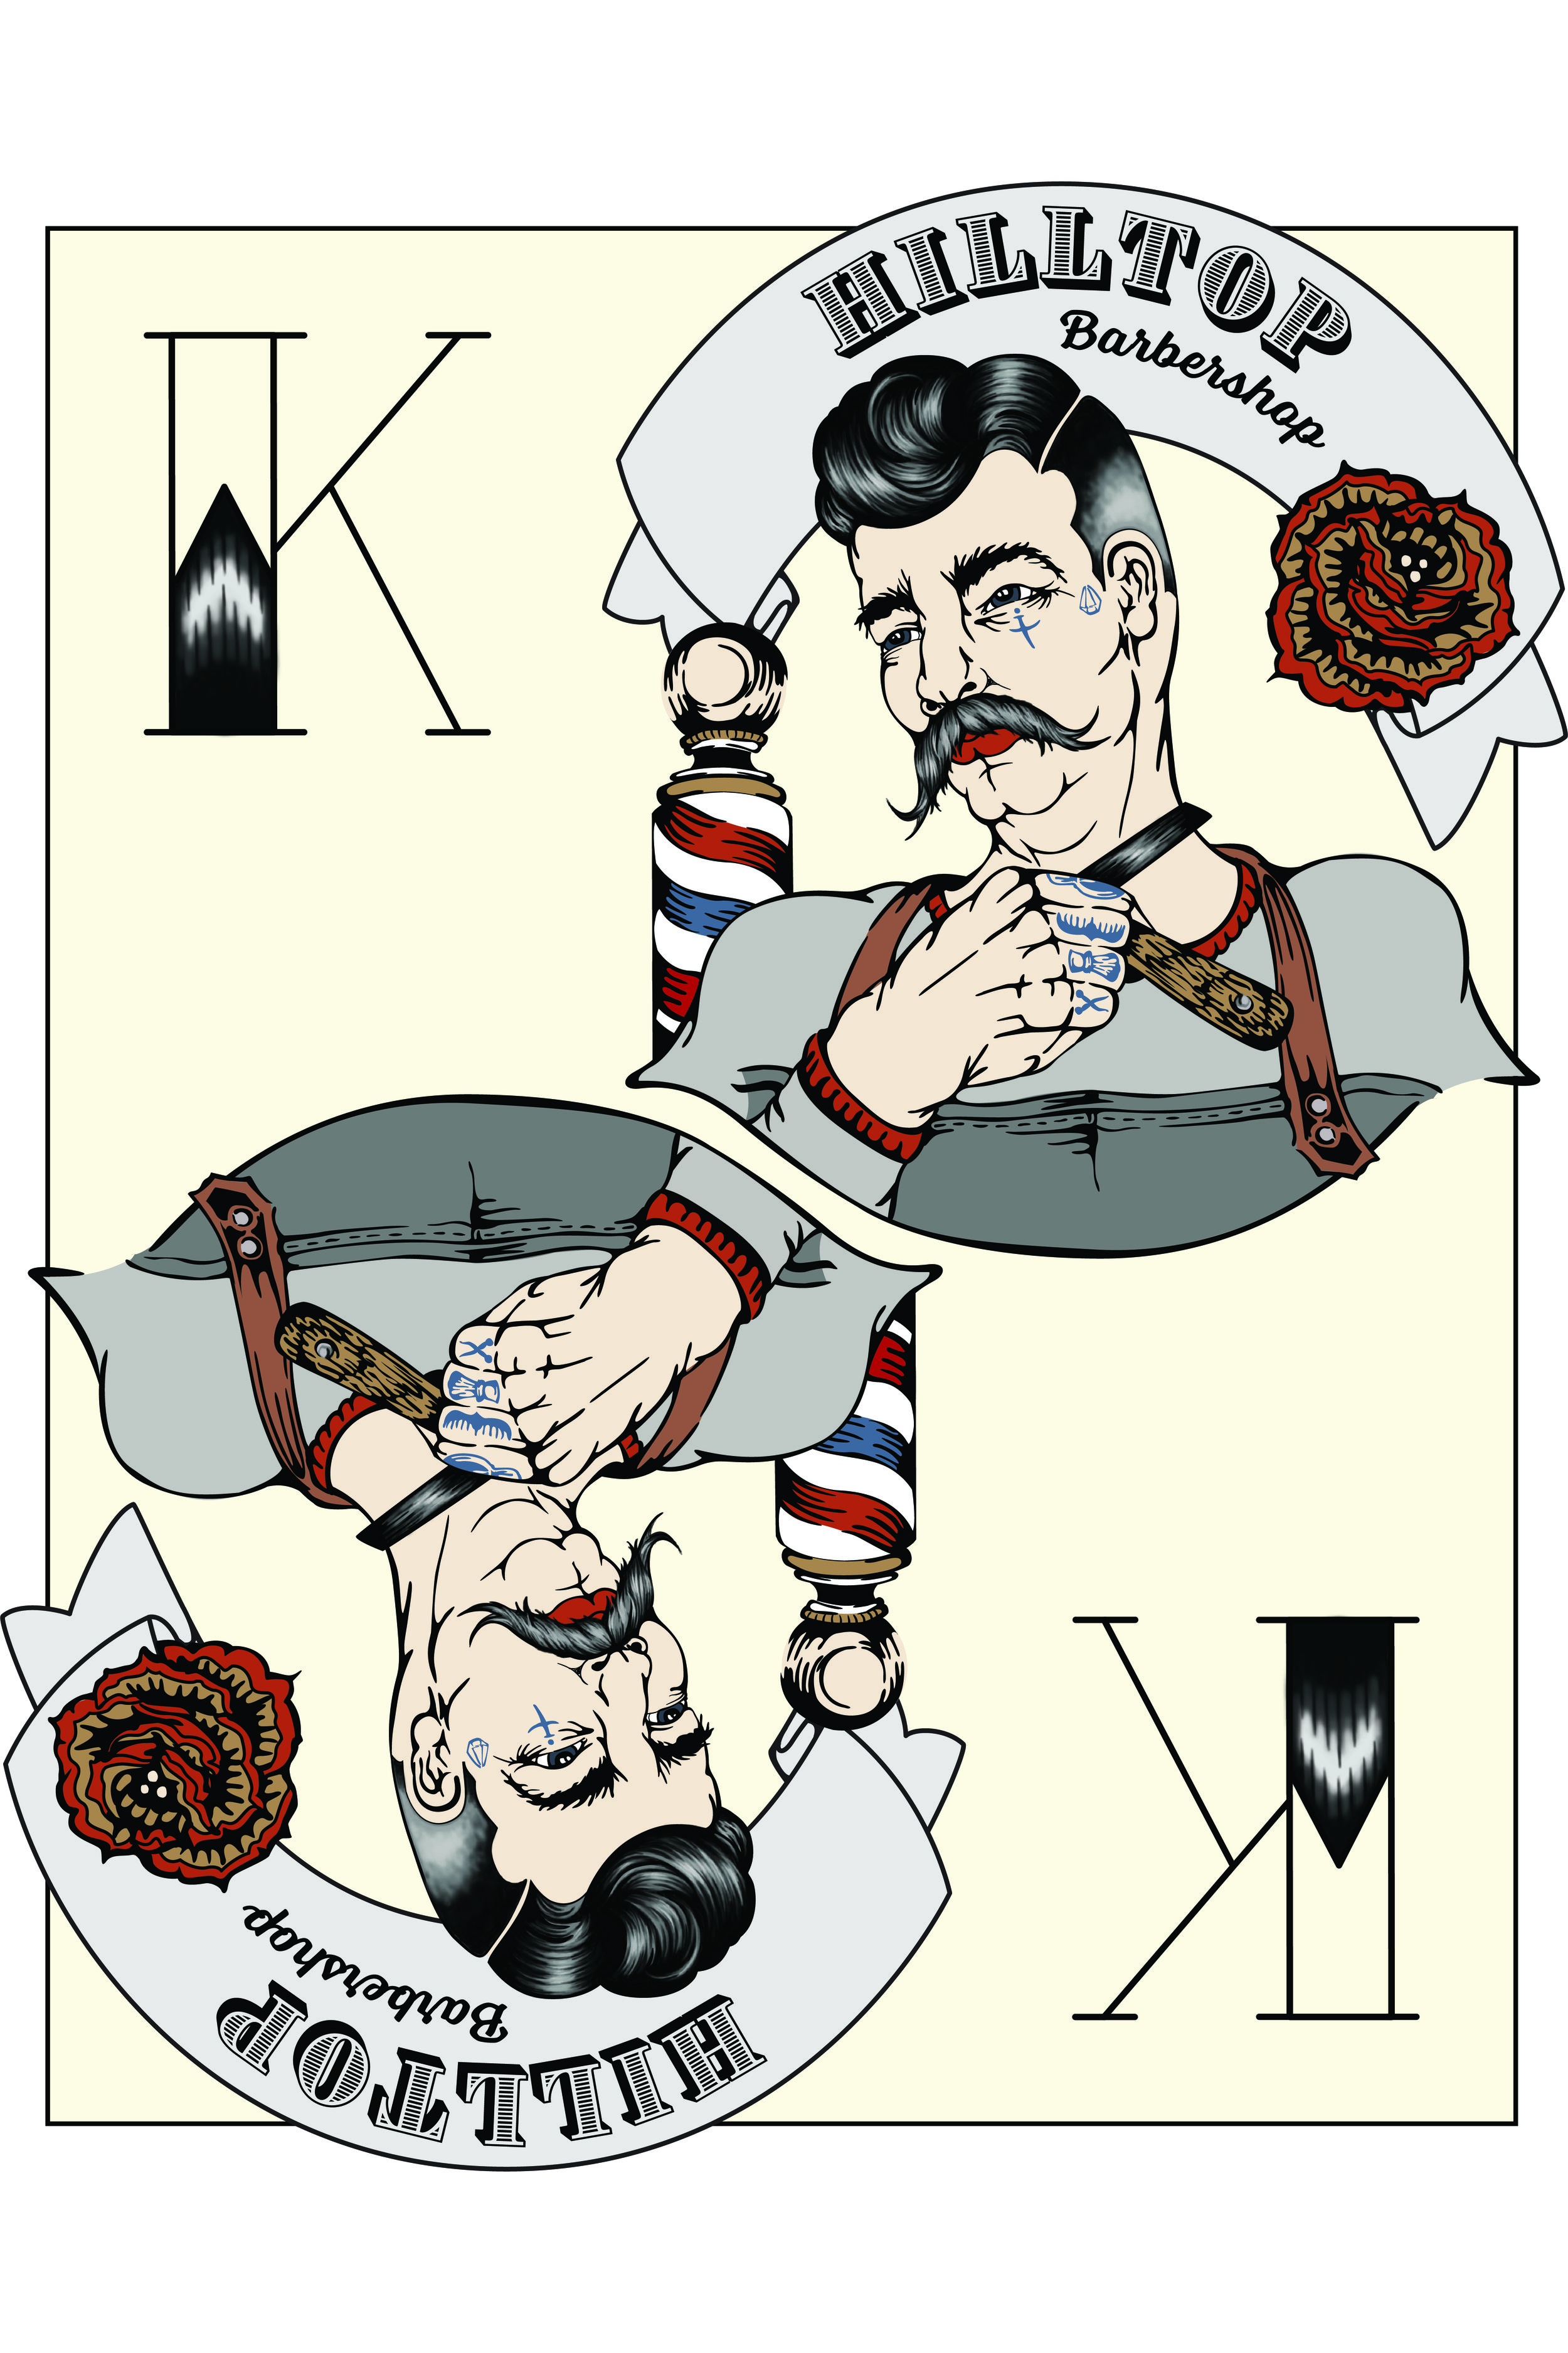 Hilltop Barbershop King